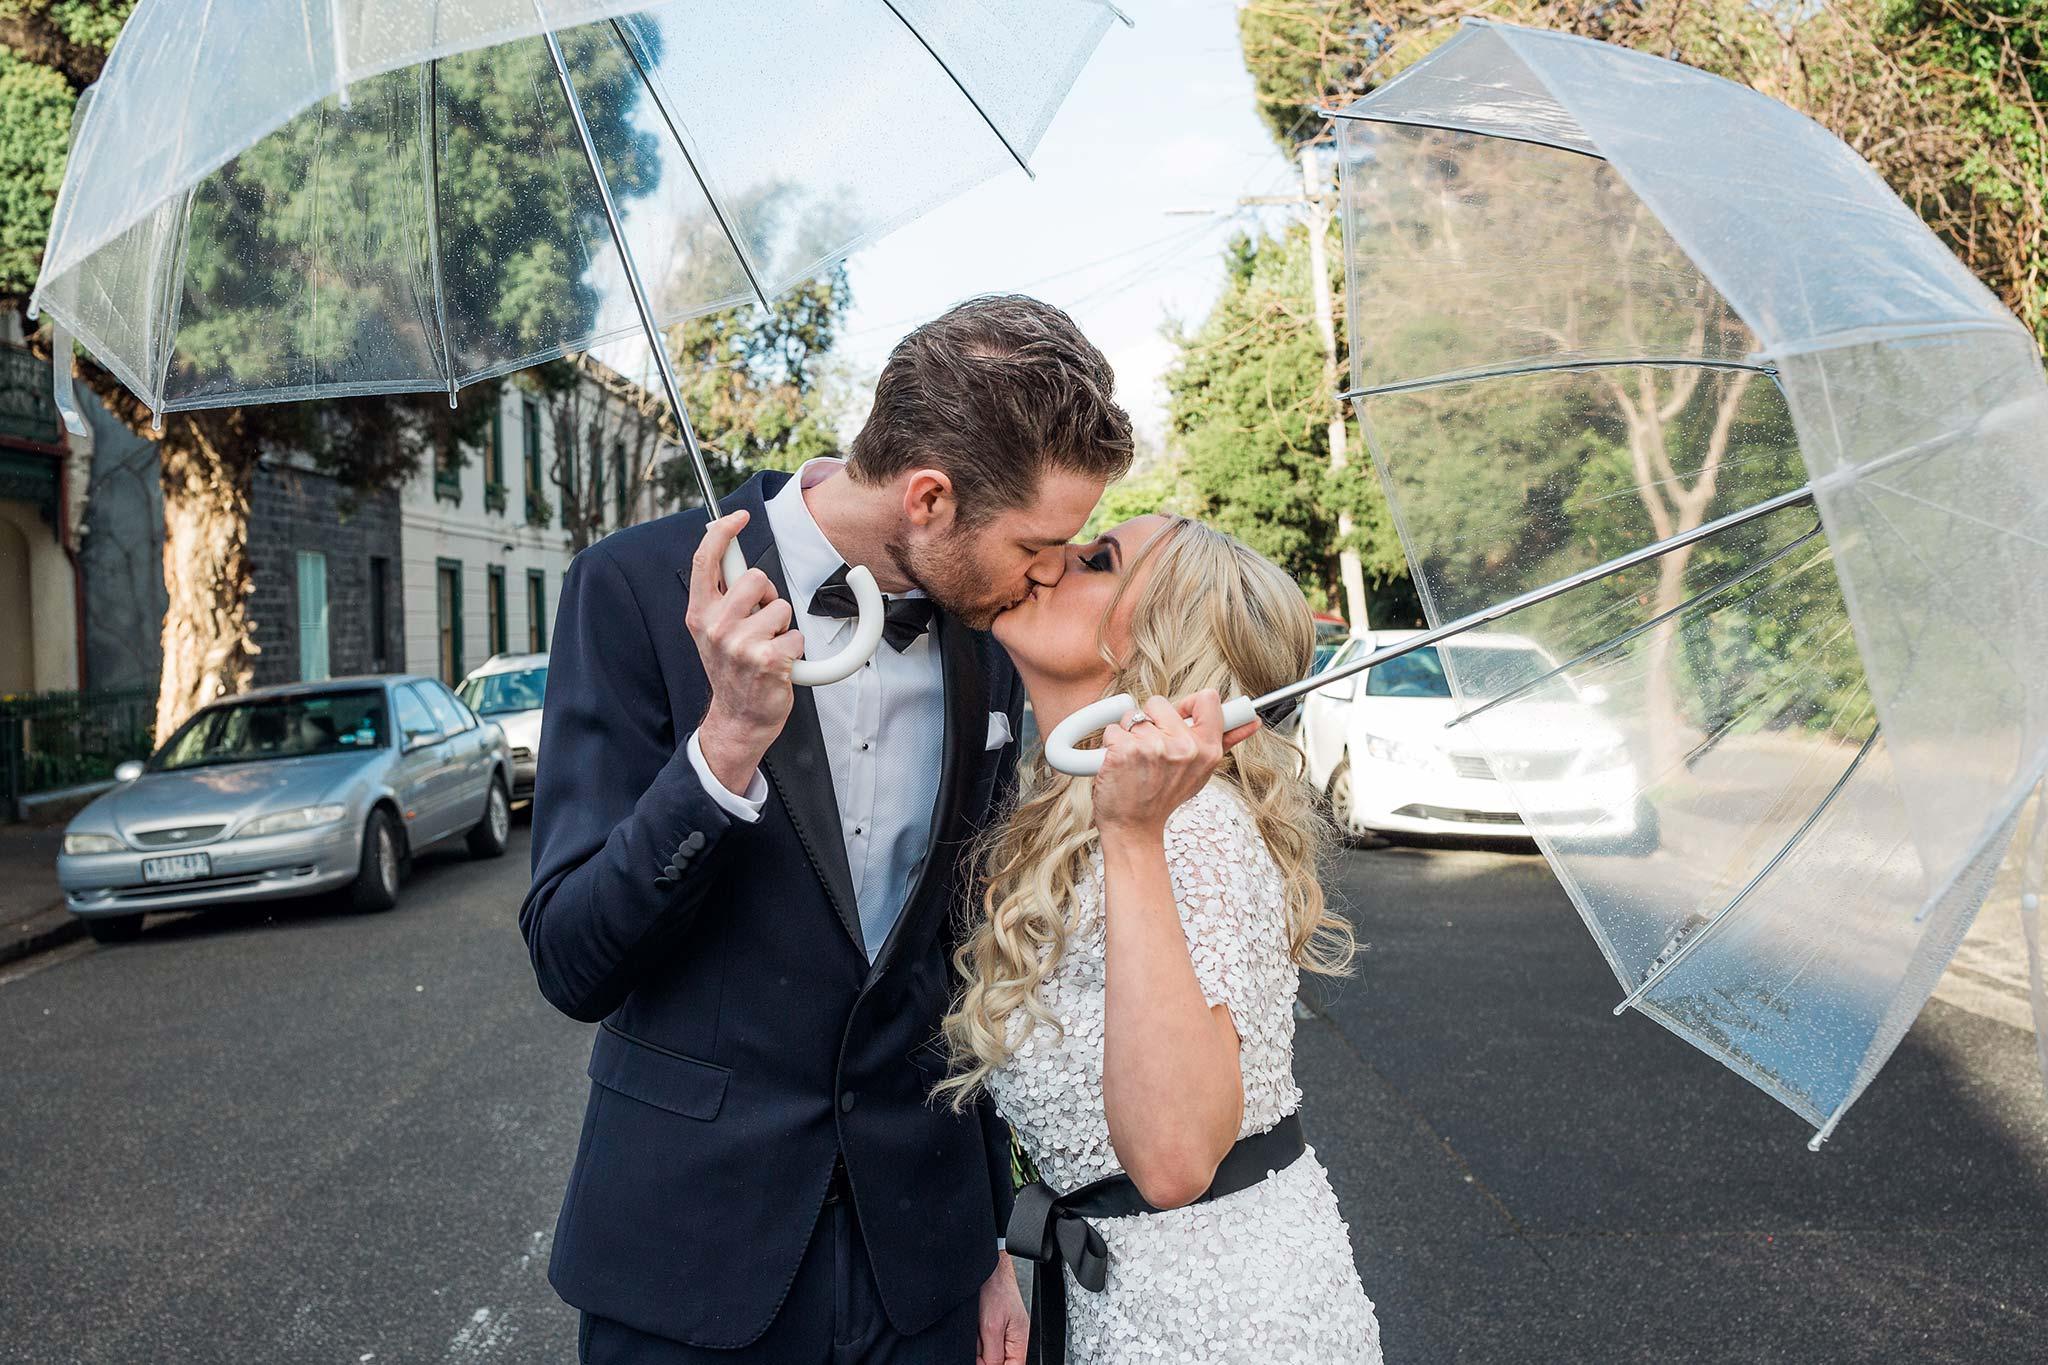 melbourne-fitzroy-st-andrews-conservatory-pumphouse-wedding-venue-bride-groom-kiss